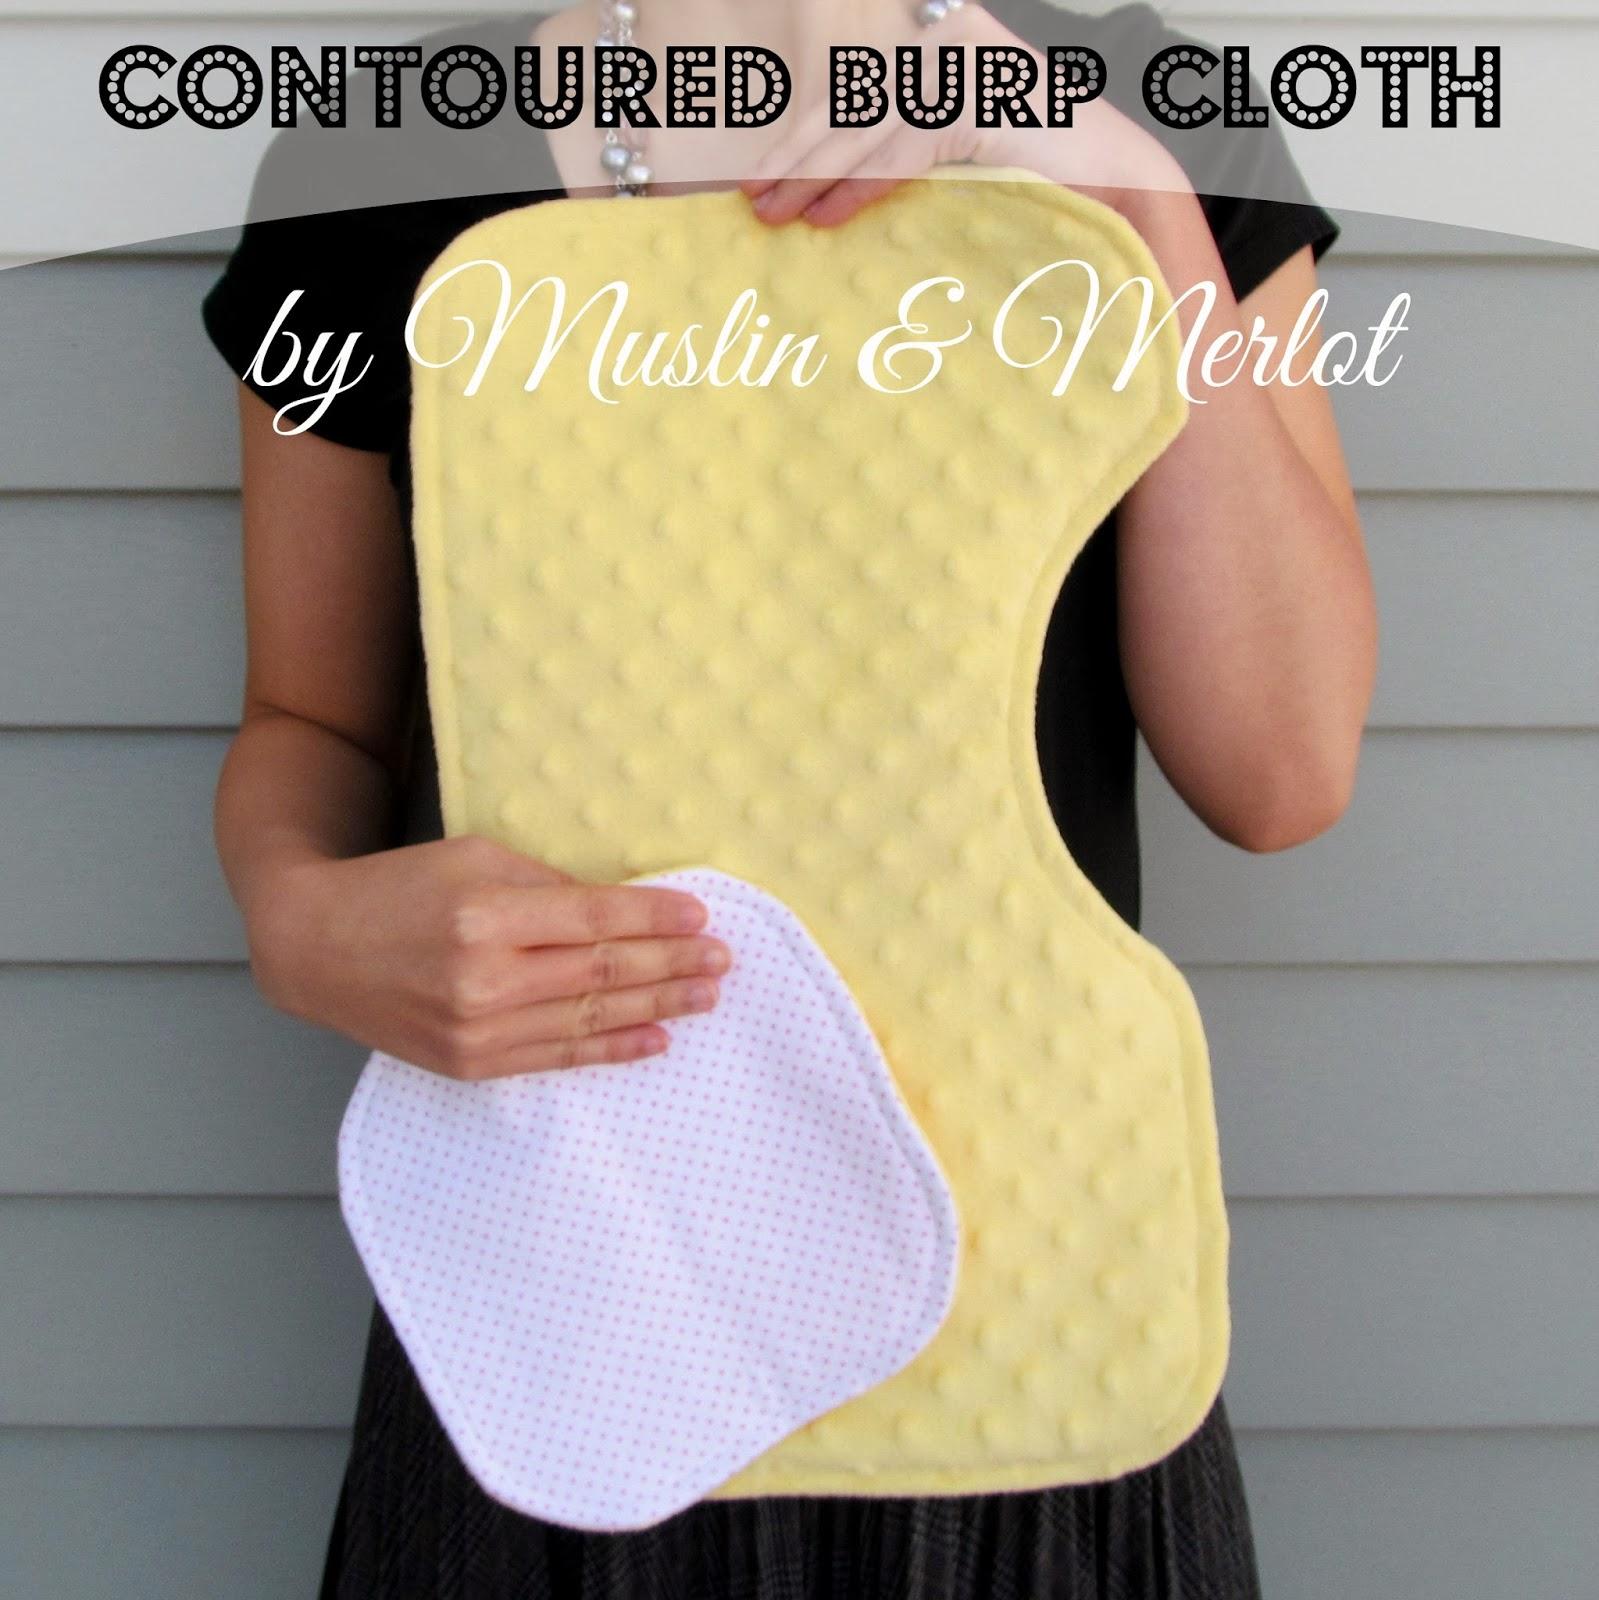 Contoured Burp Cloth by Muslin & Merlot. Free printable template!